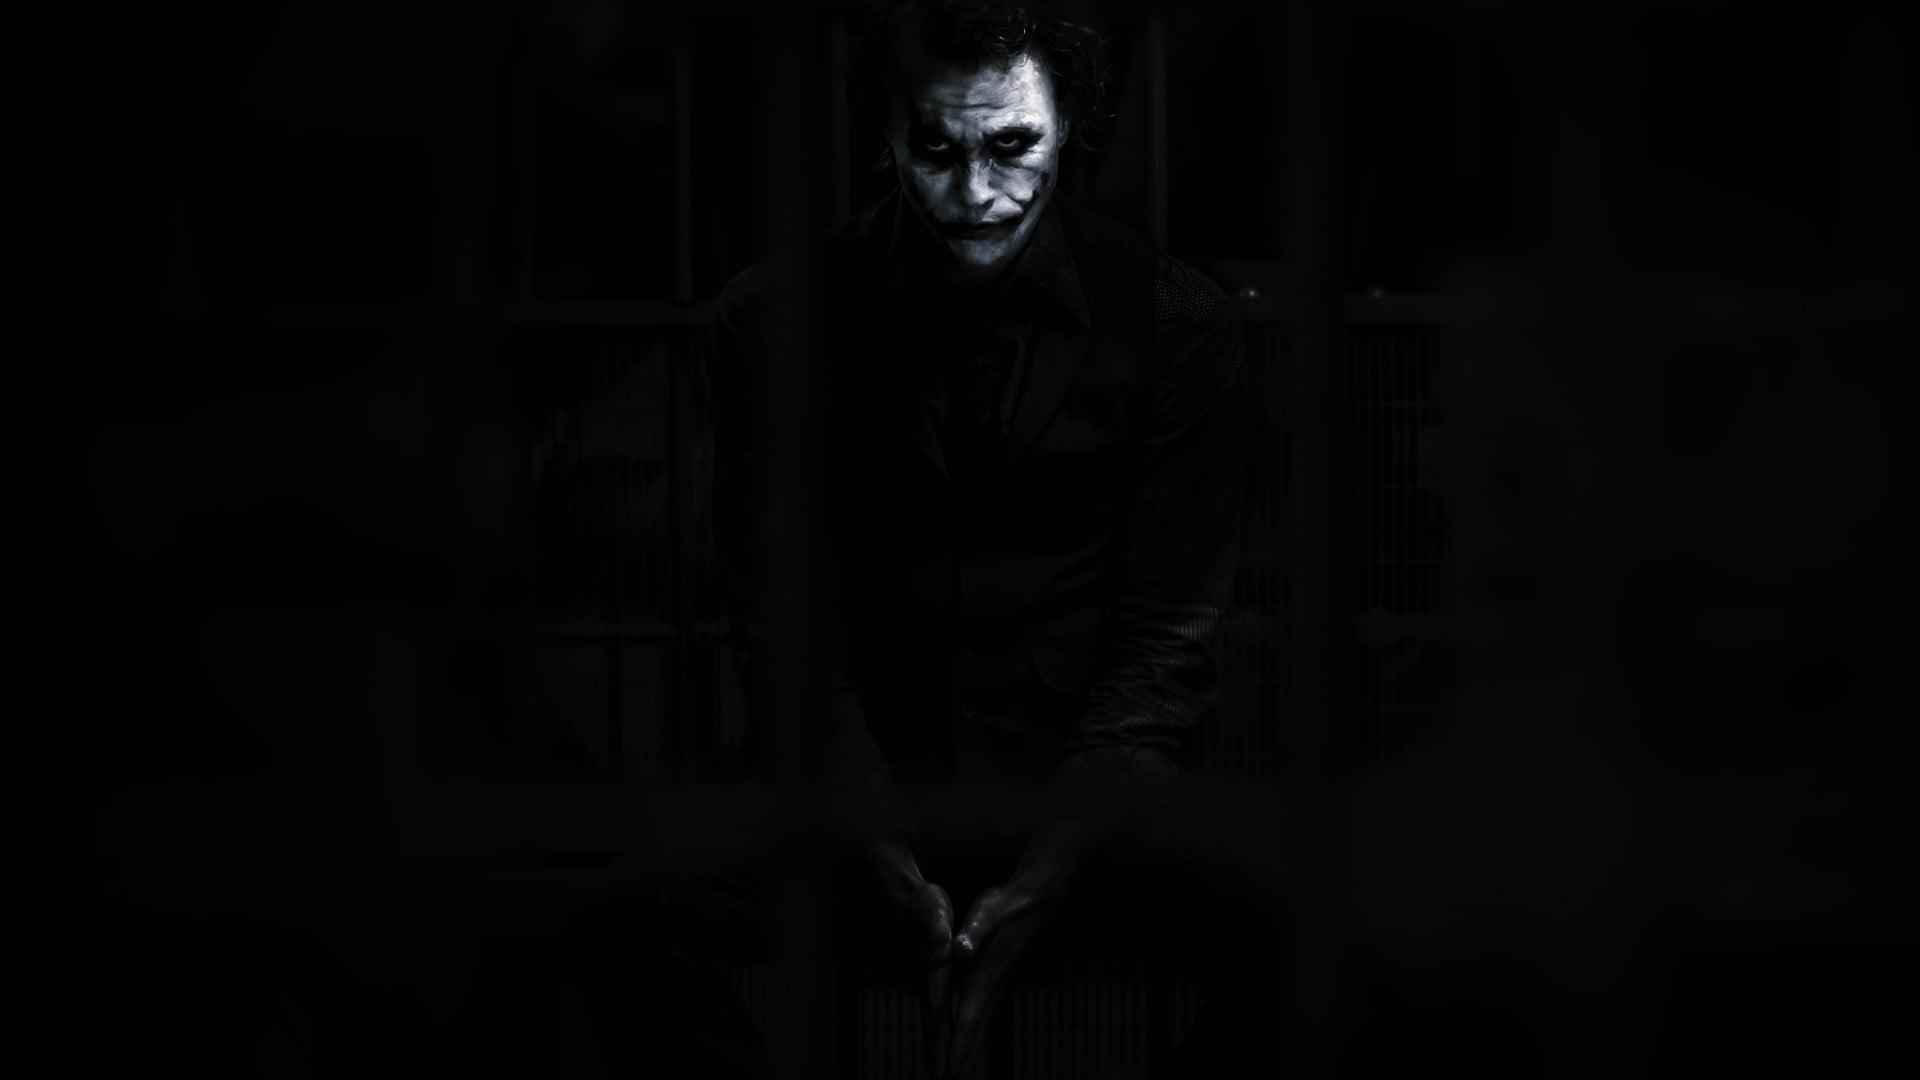 Joker Heath Ledger Wallpapers - Wallpaper Cave